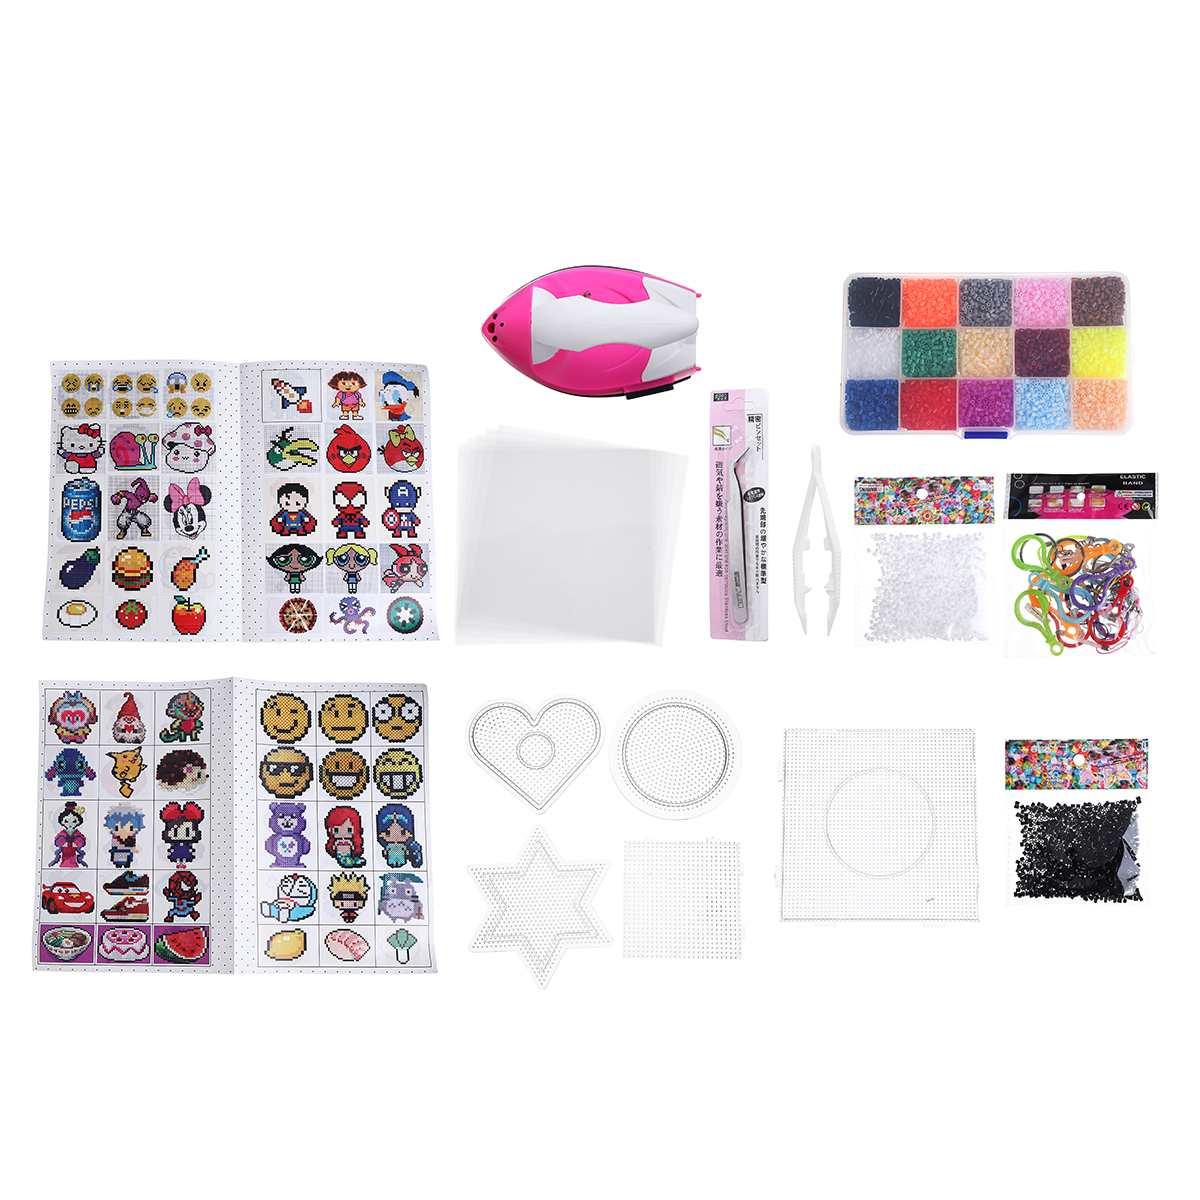 8000pcs 2.6mm EVA Hama Beads Set Toy Kids Fun Craft DIY Handmaking Fuse Bead Multicolor Intelligence Educational Toys